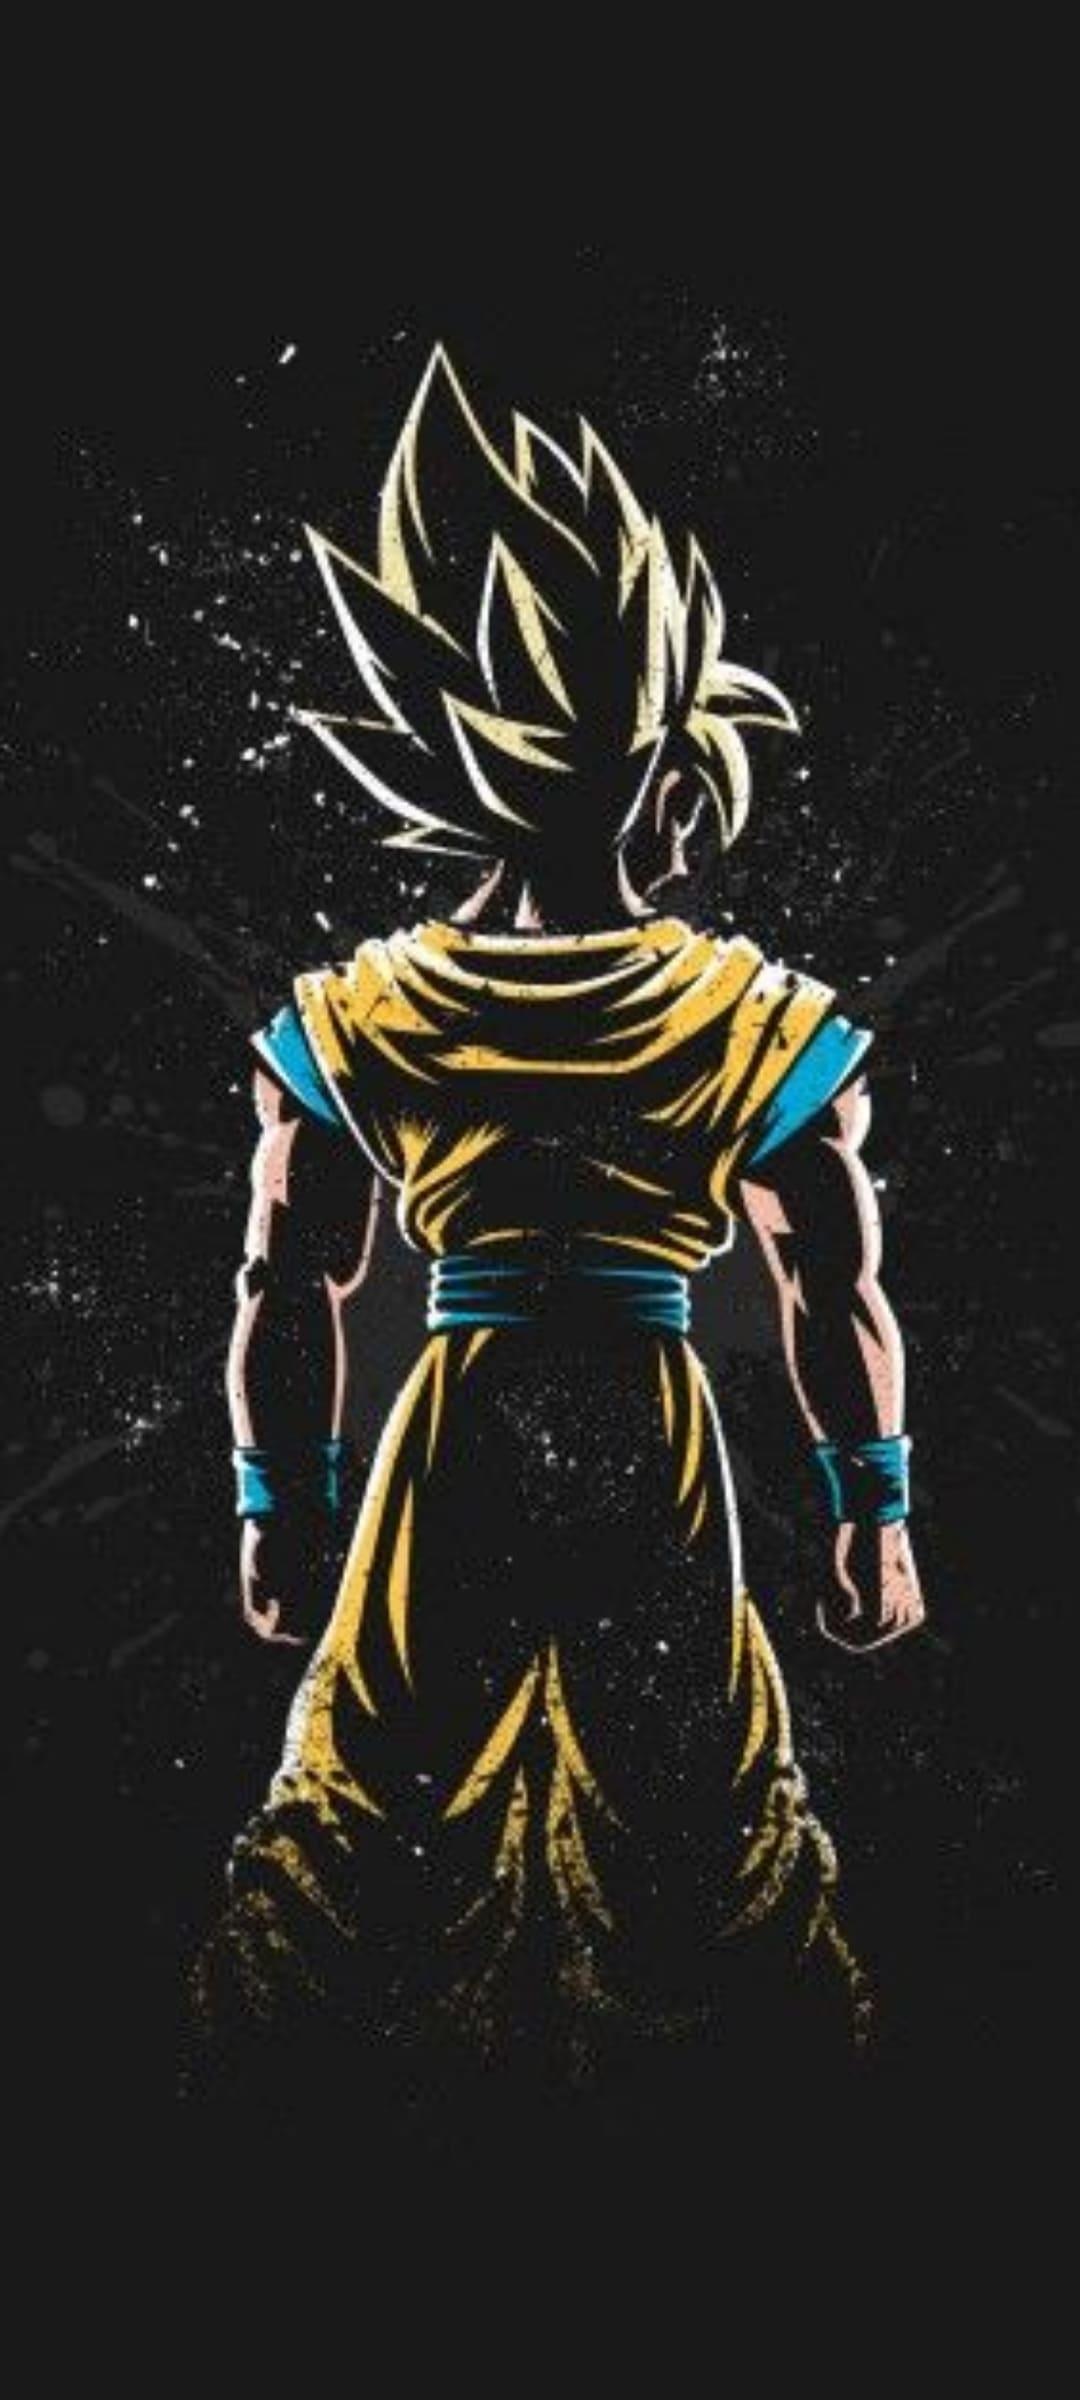 85 Áˆ Goku Wallpapers Top 4k Goku Wallpaper Download Hd